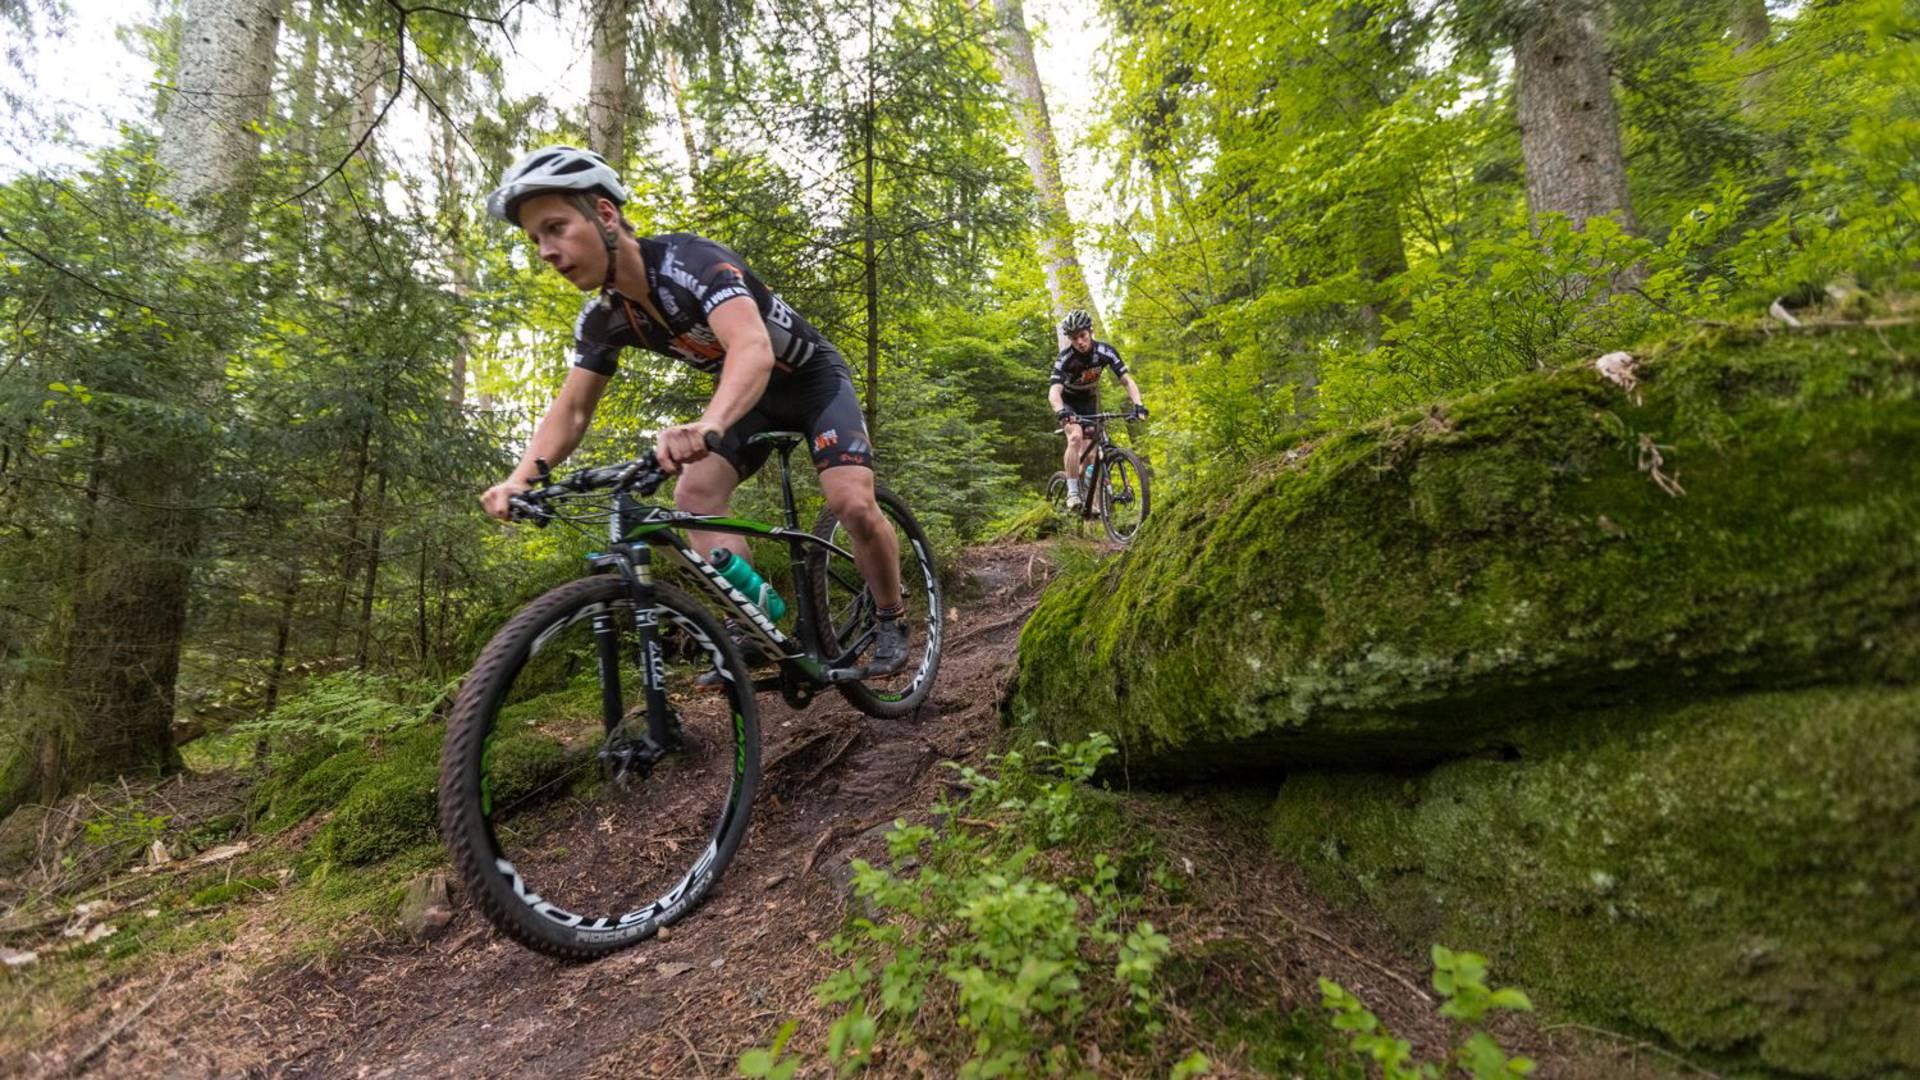 Descente de VTT - VTT Epinal - Vélo en forêt